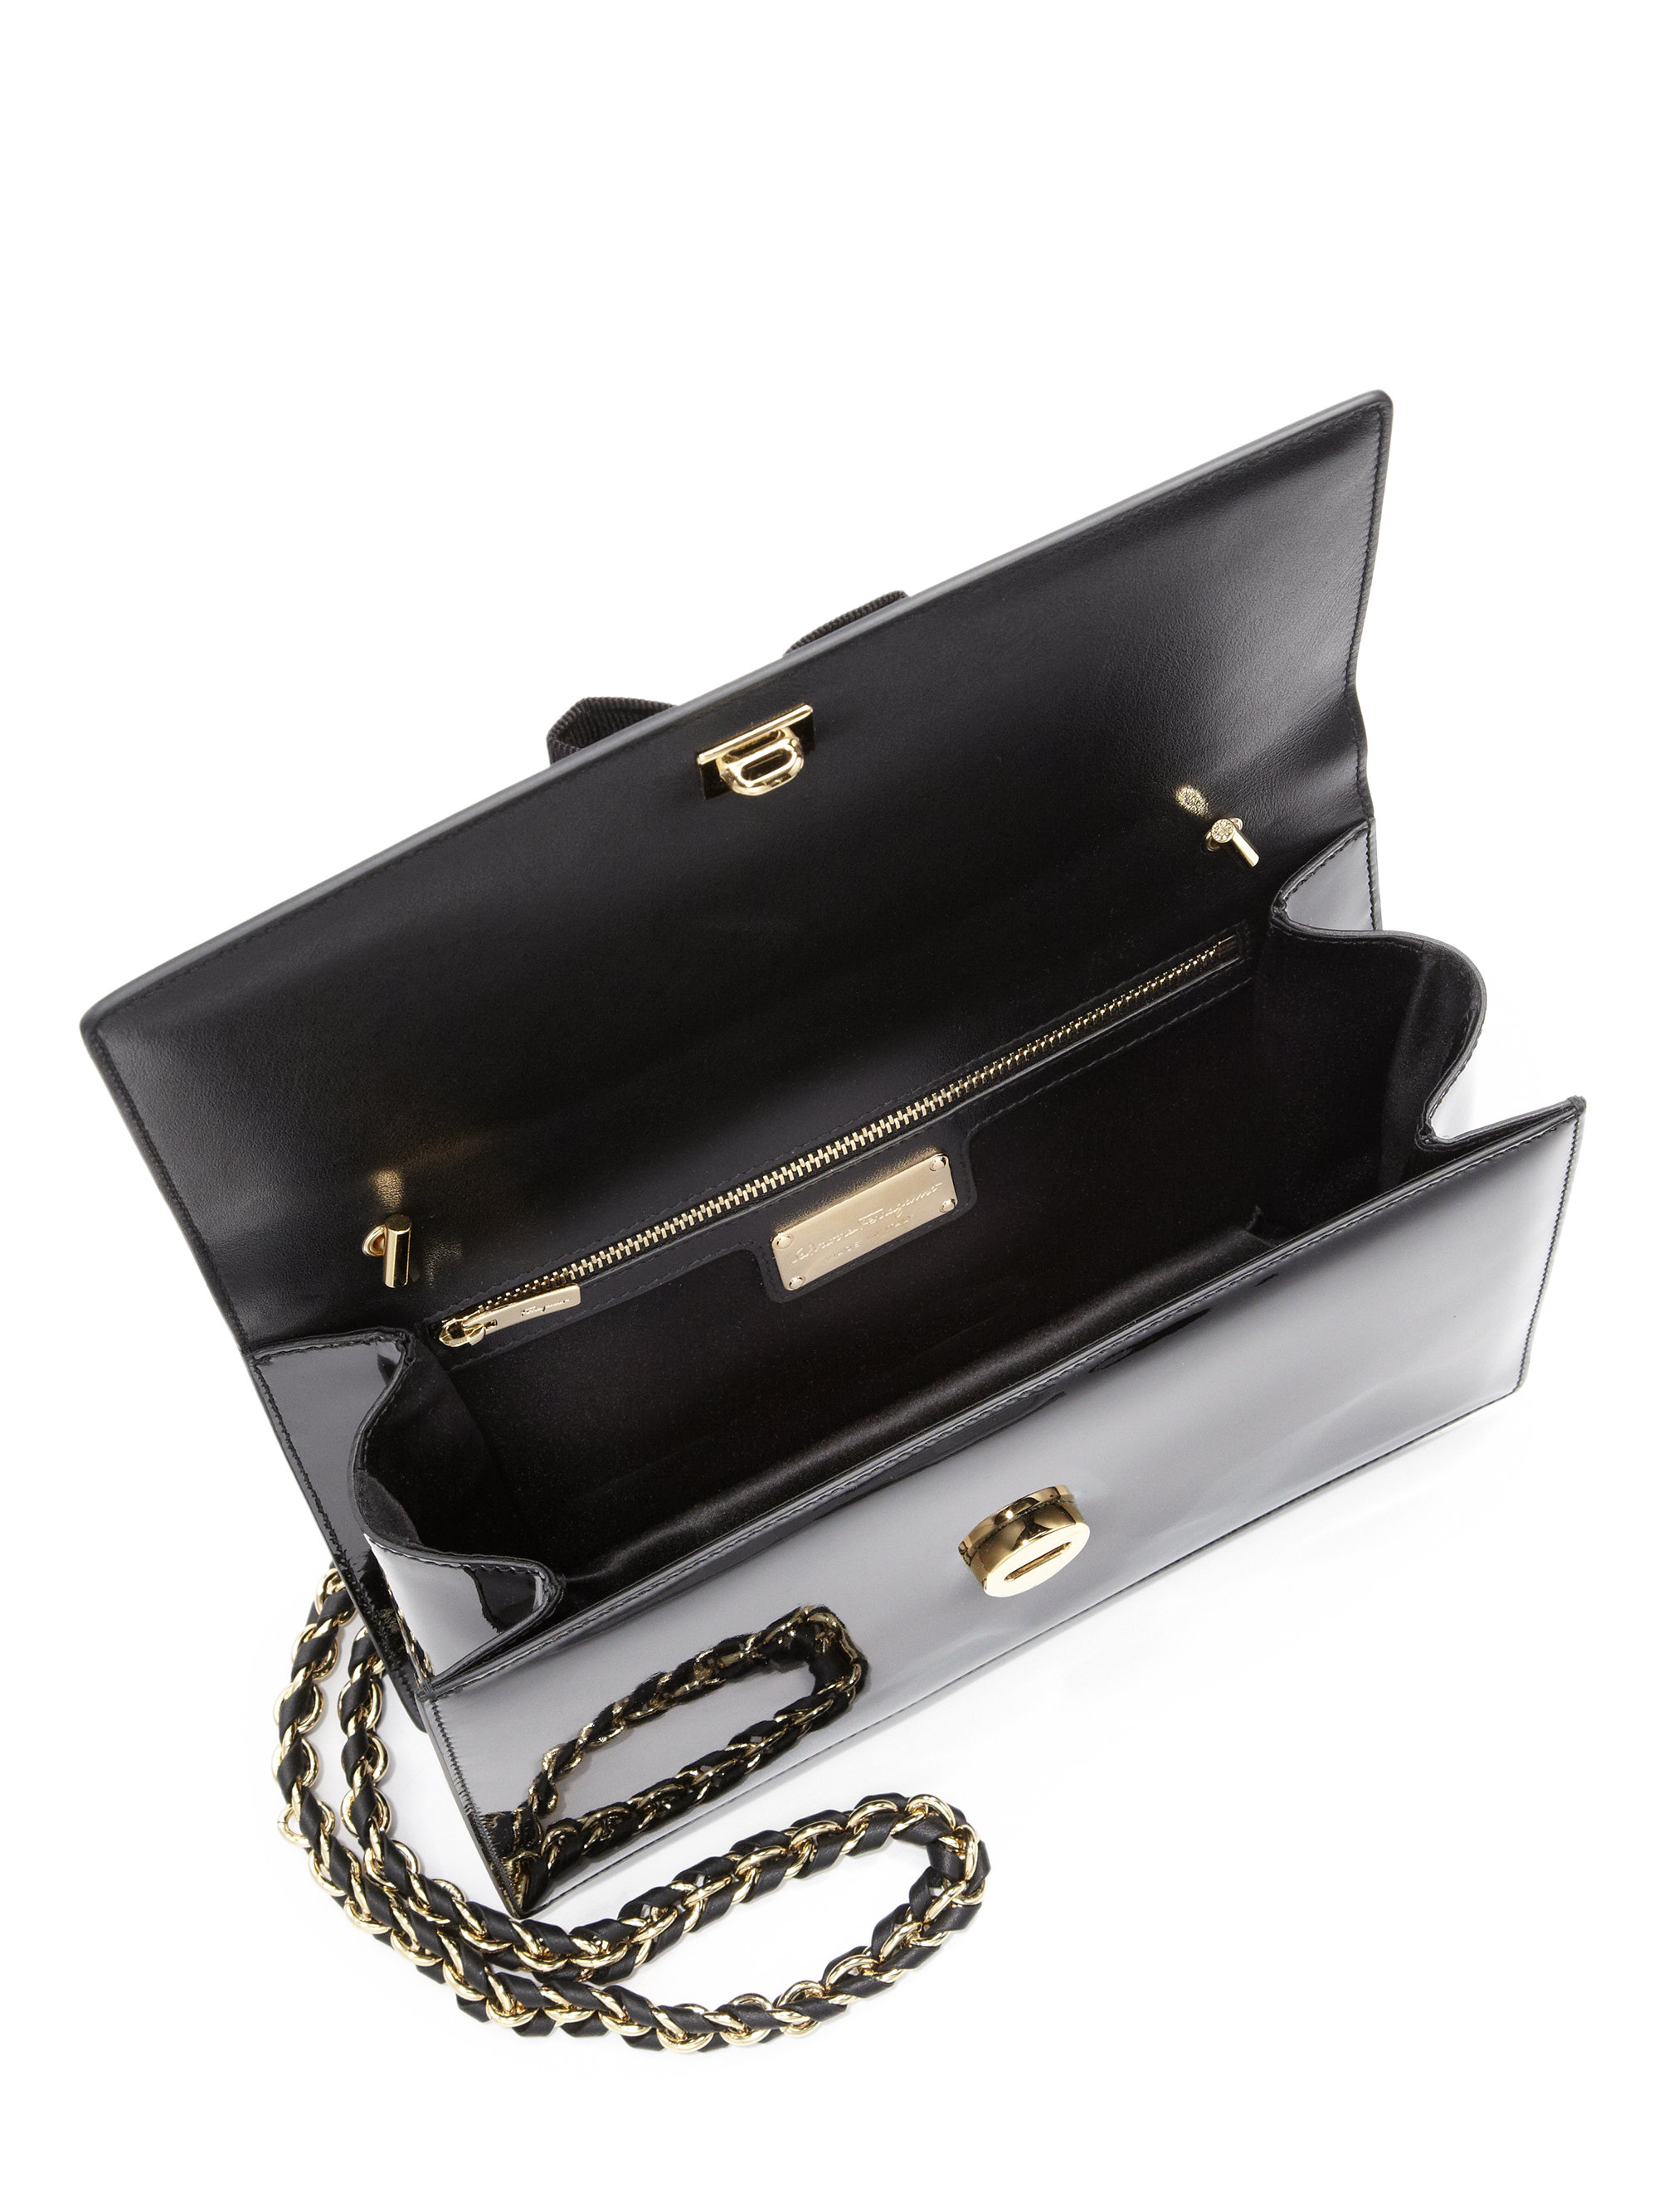 Ferragamo Ginny Medium Patent Leather Crossbody Bag in Black - Lyst